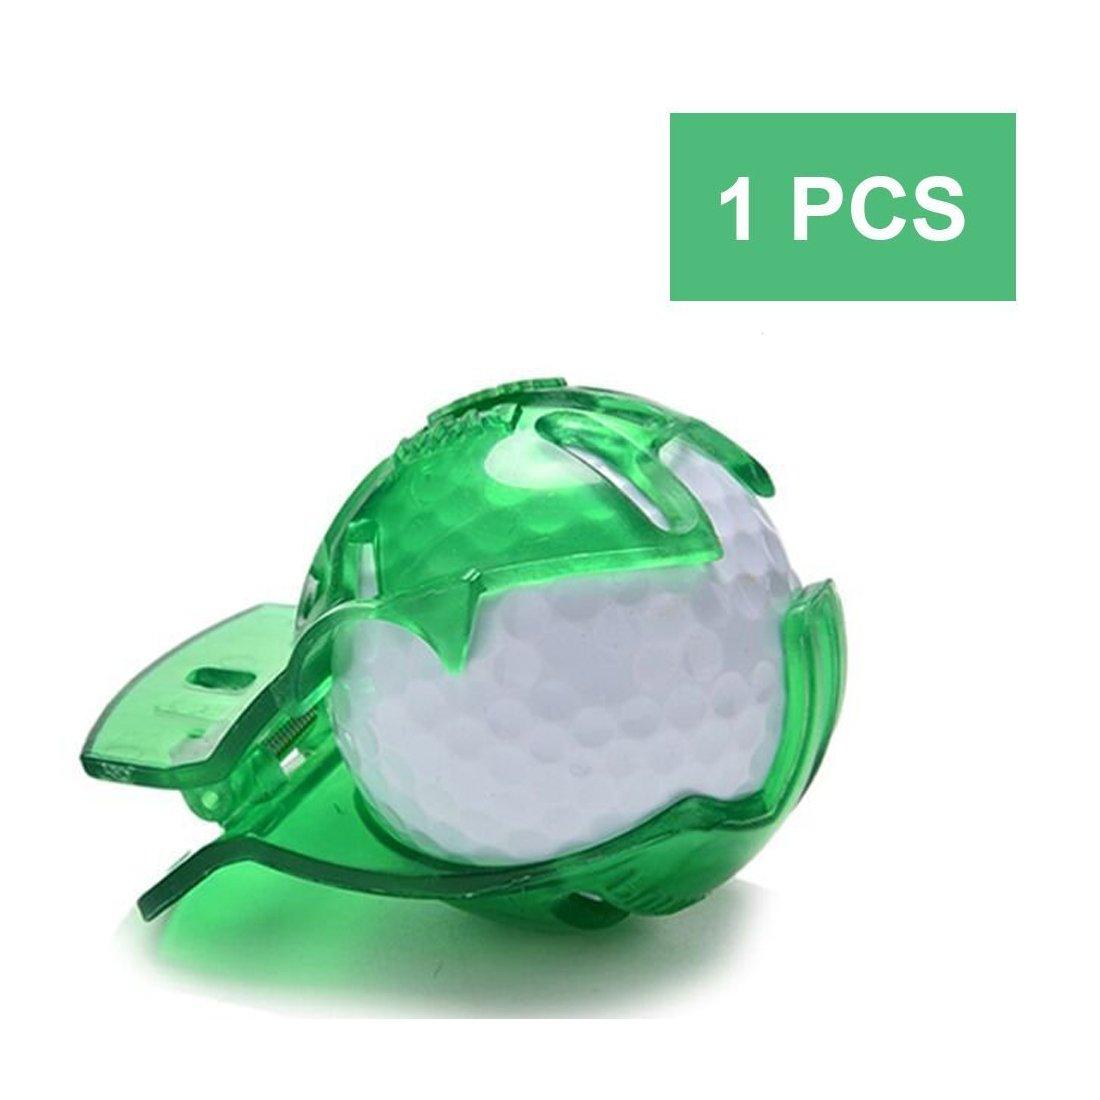 Golf Ball Tool,Bagvhandbagro 1Pcs Golf Ball Line Liner Marker,Template Drawing Mark Alignment Putting Tool   B0722M721P